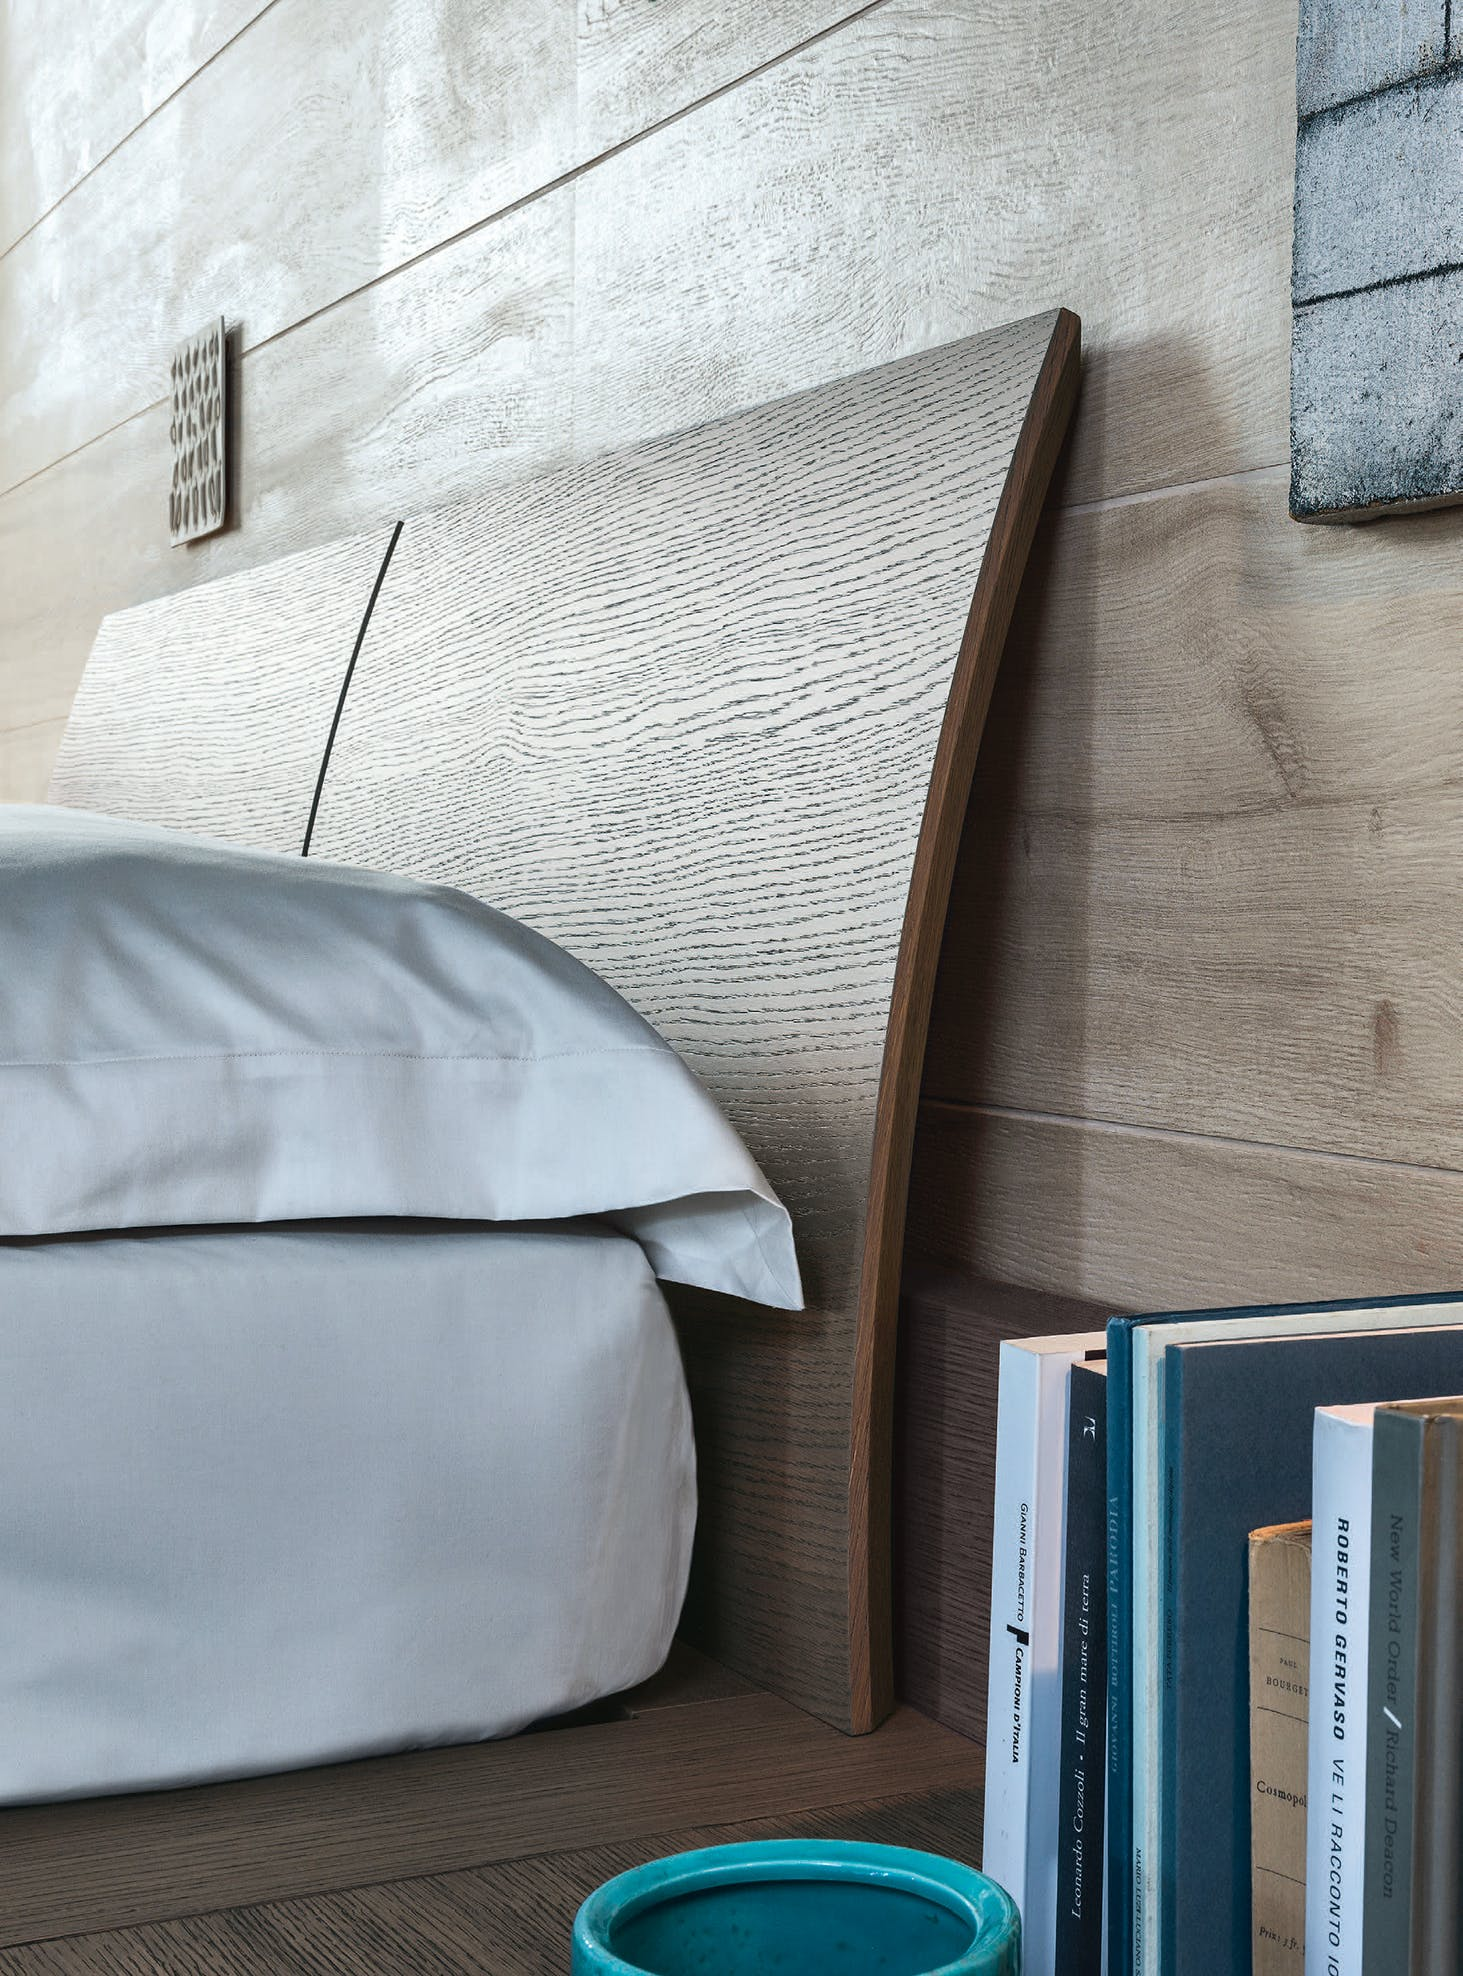 Giellesse Avalon Bed Board Angle Haute Living